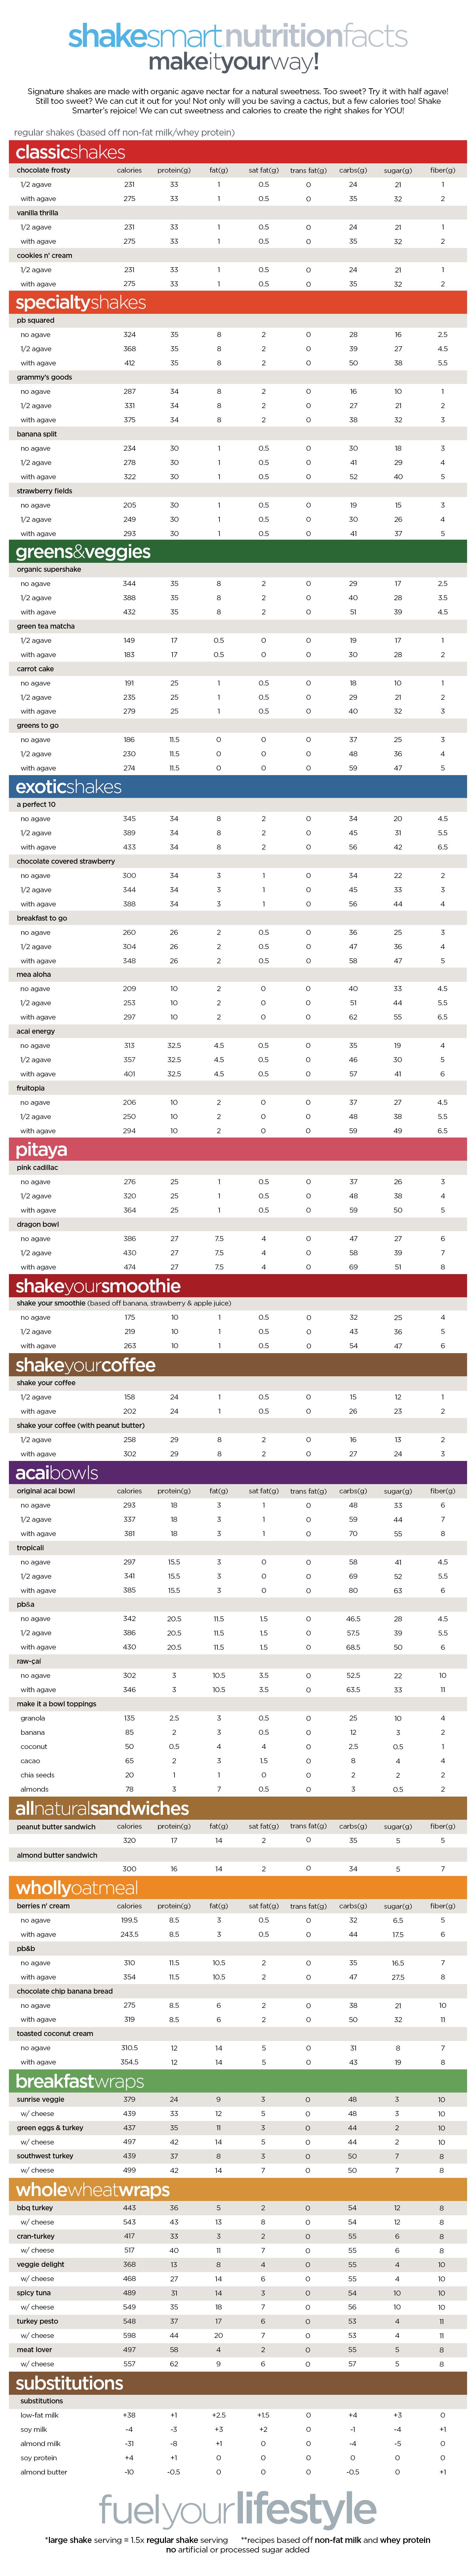 menu-shakesmart-new